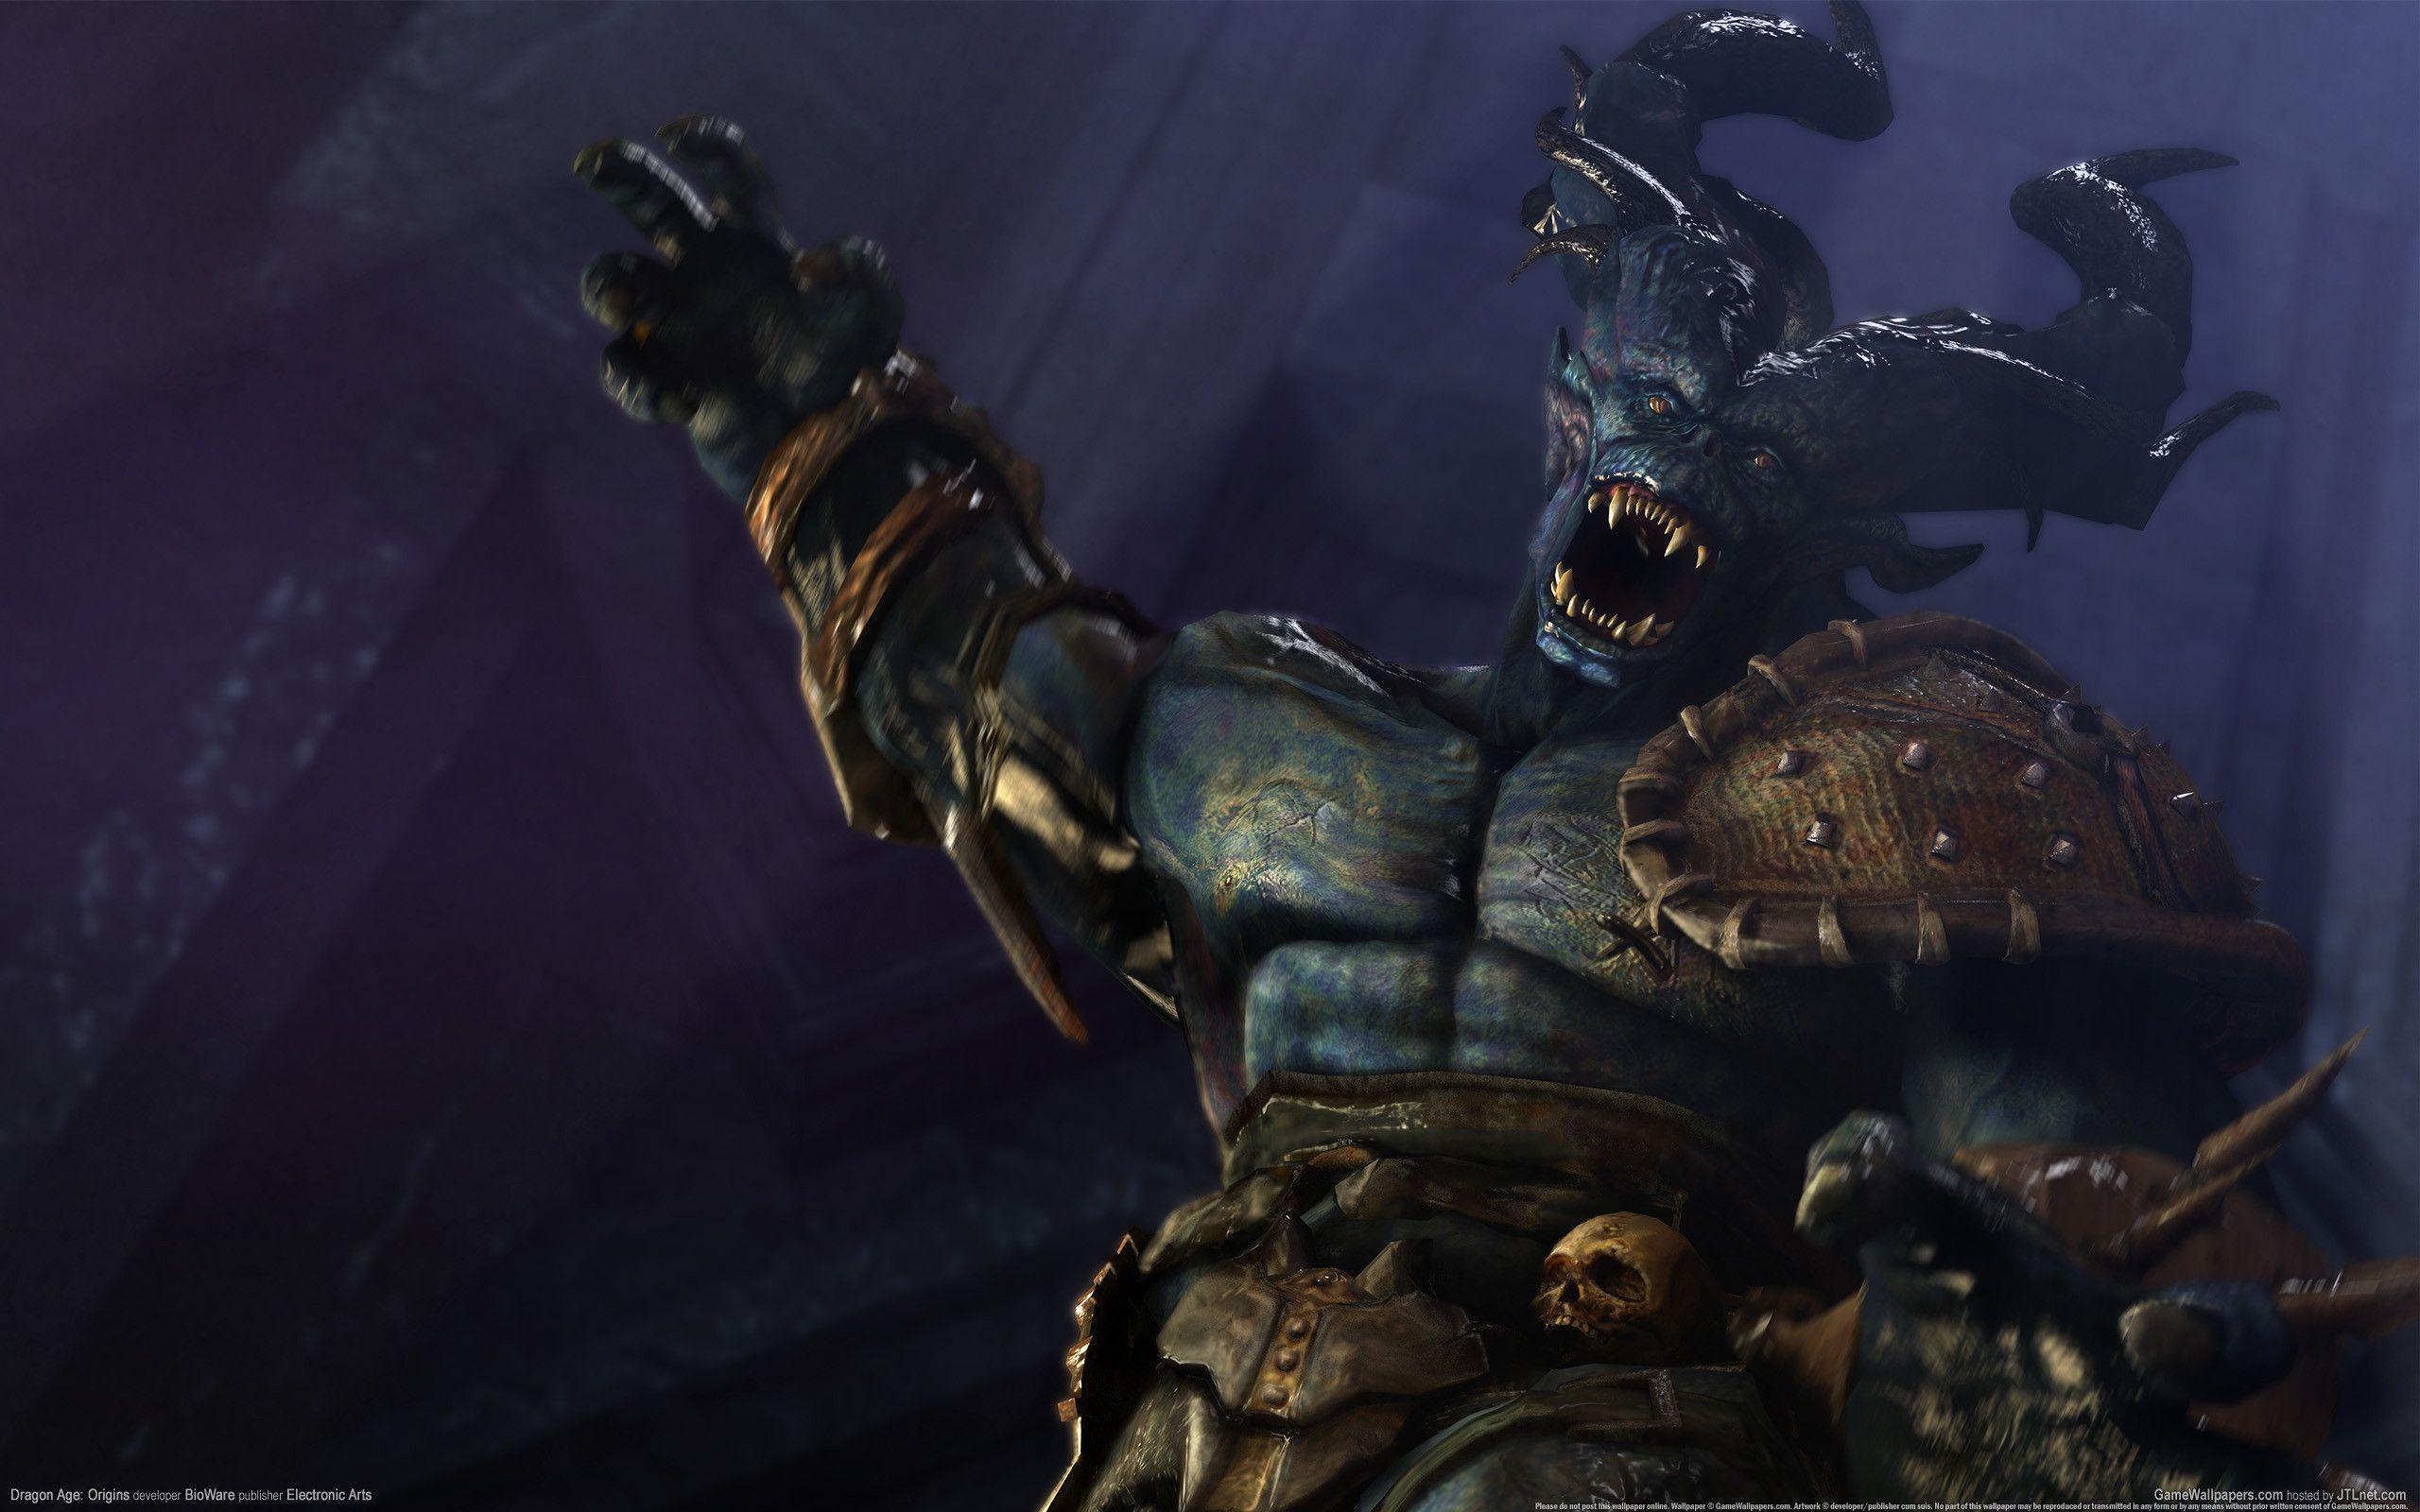 Dragon age origins wallpapers - SF Wallpaper